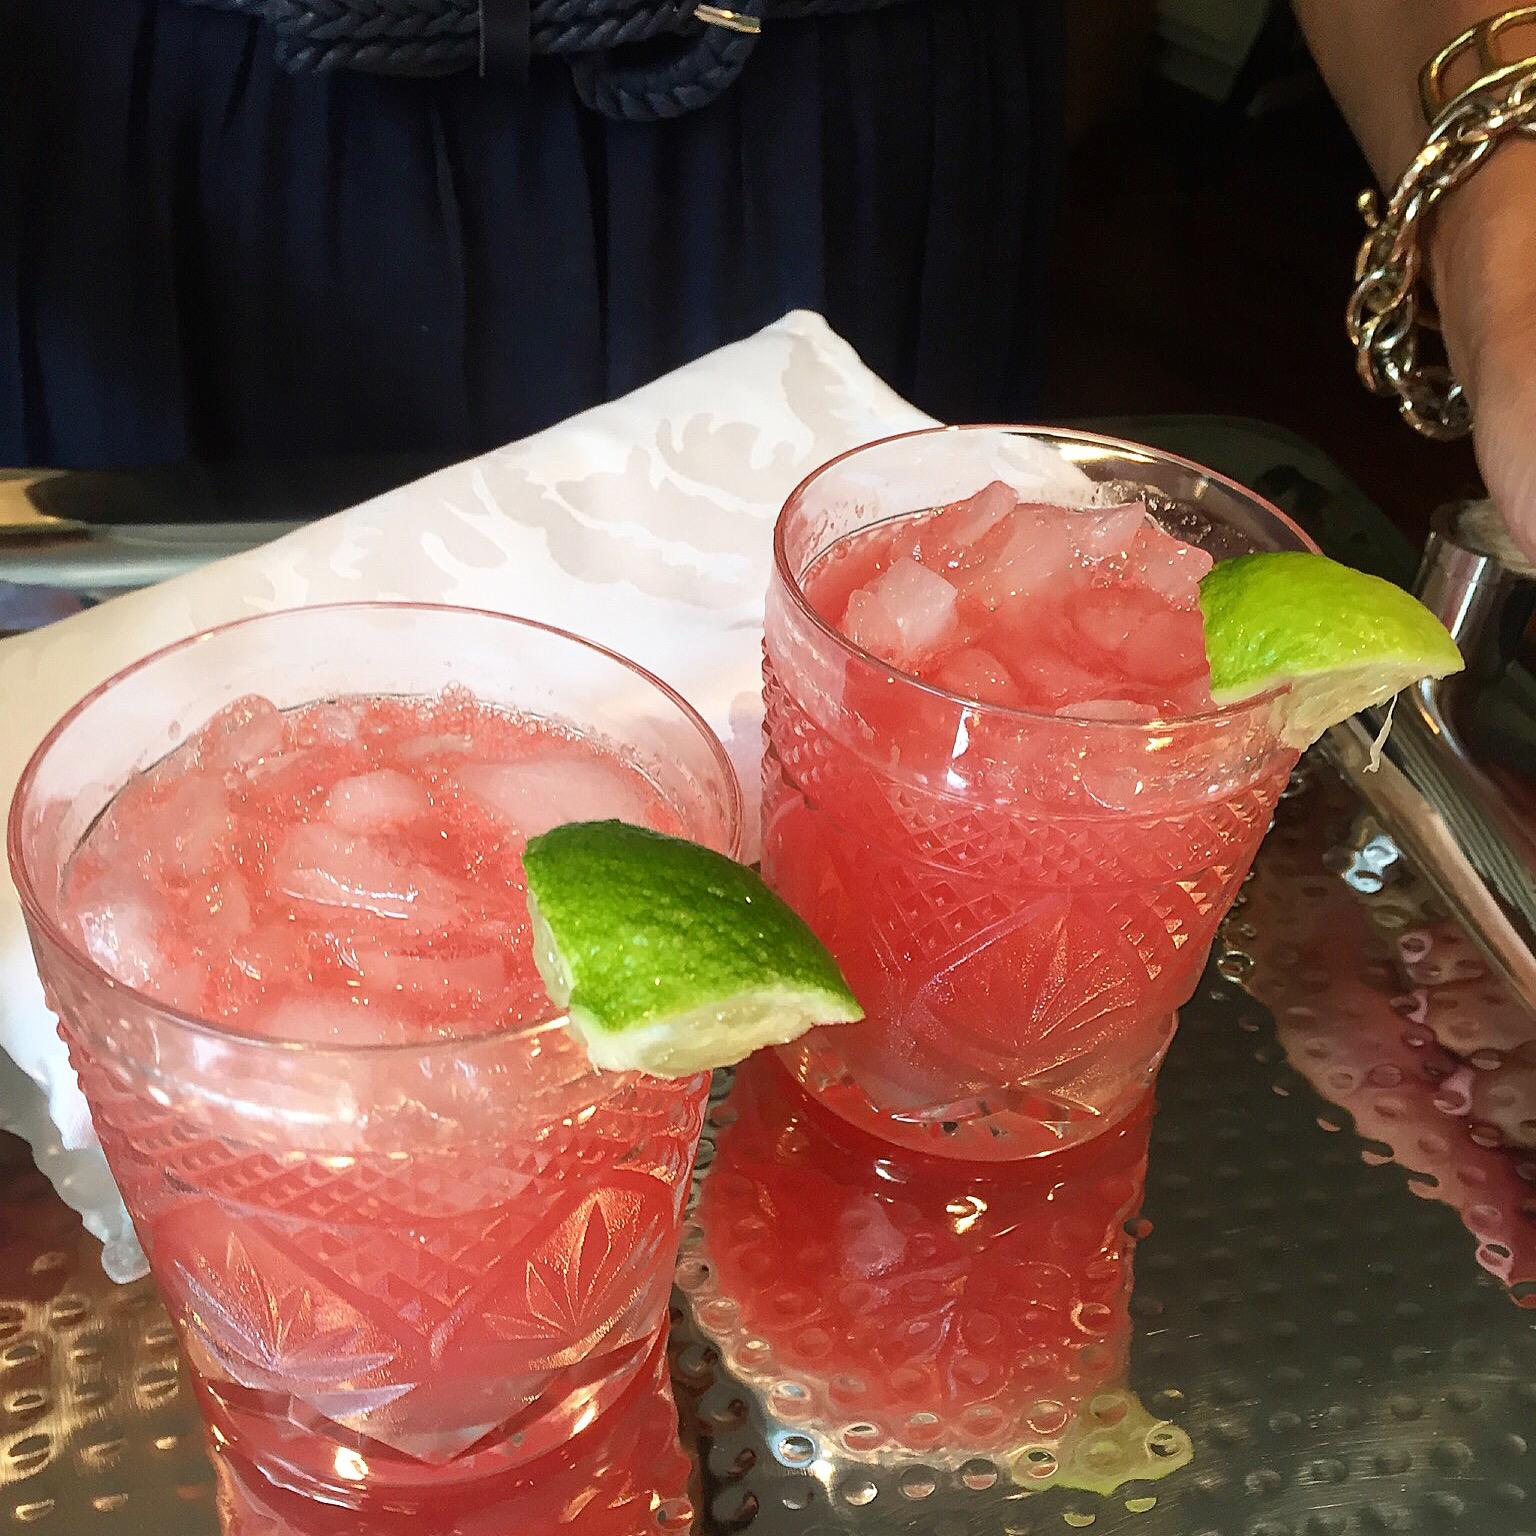 watermelon gin fizz recipe by New England Fine Living 1.JPG